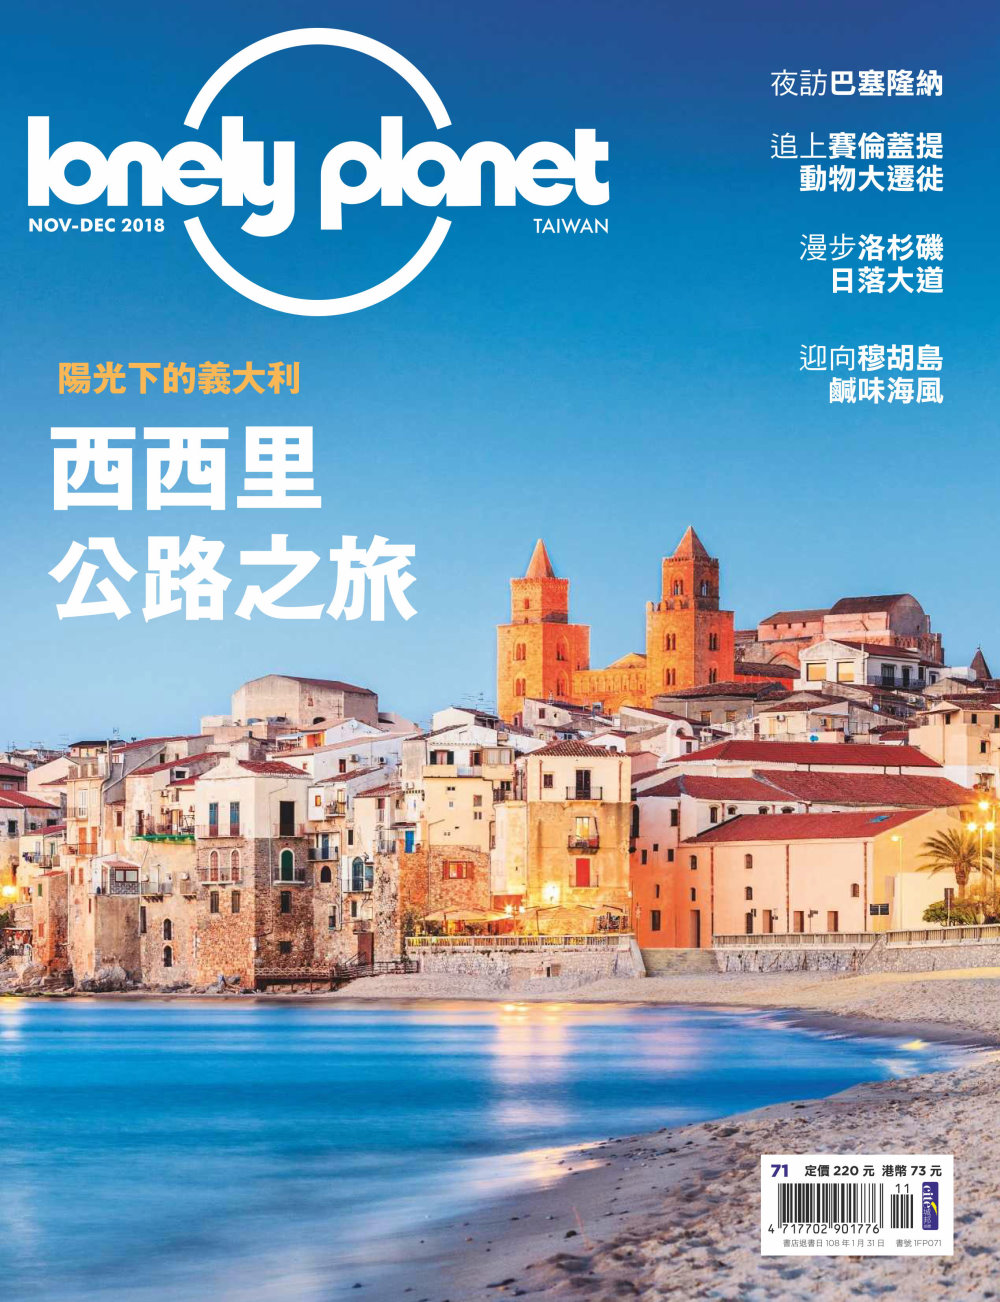 孤獨星球Lonely Planet 11月號/2018第71期